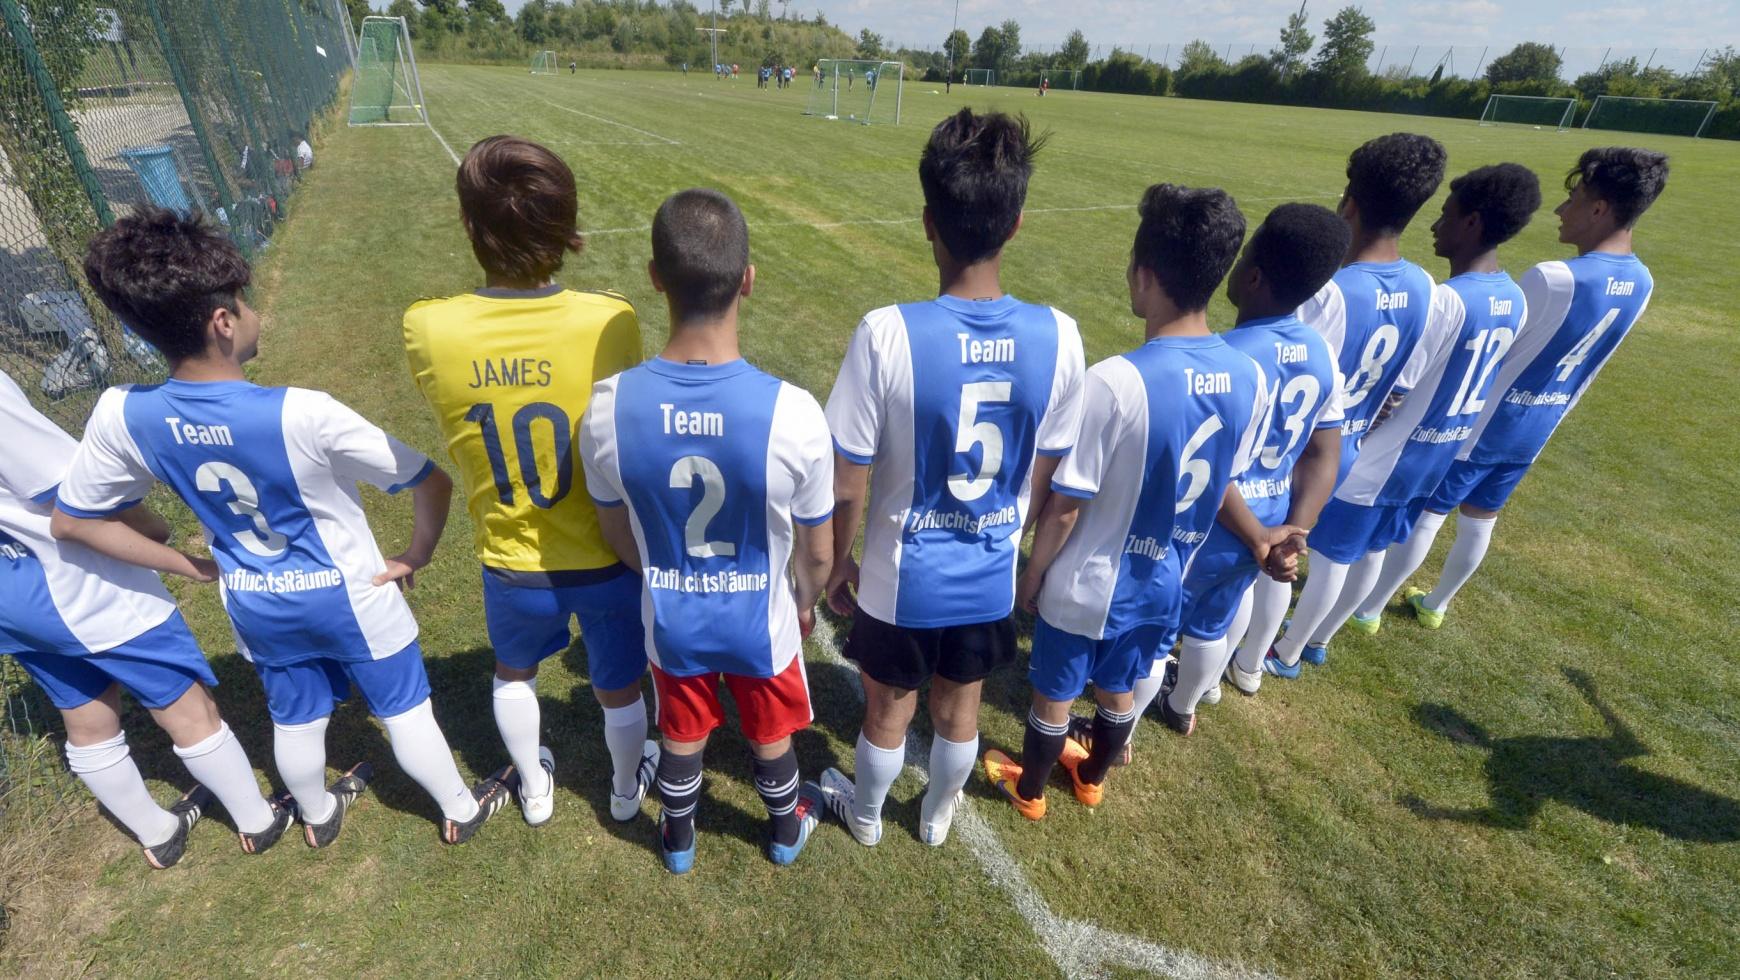 Erstes Fußballturnier der Münchner Jugendhilfe